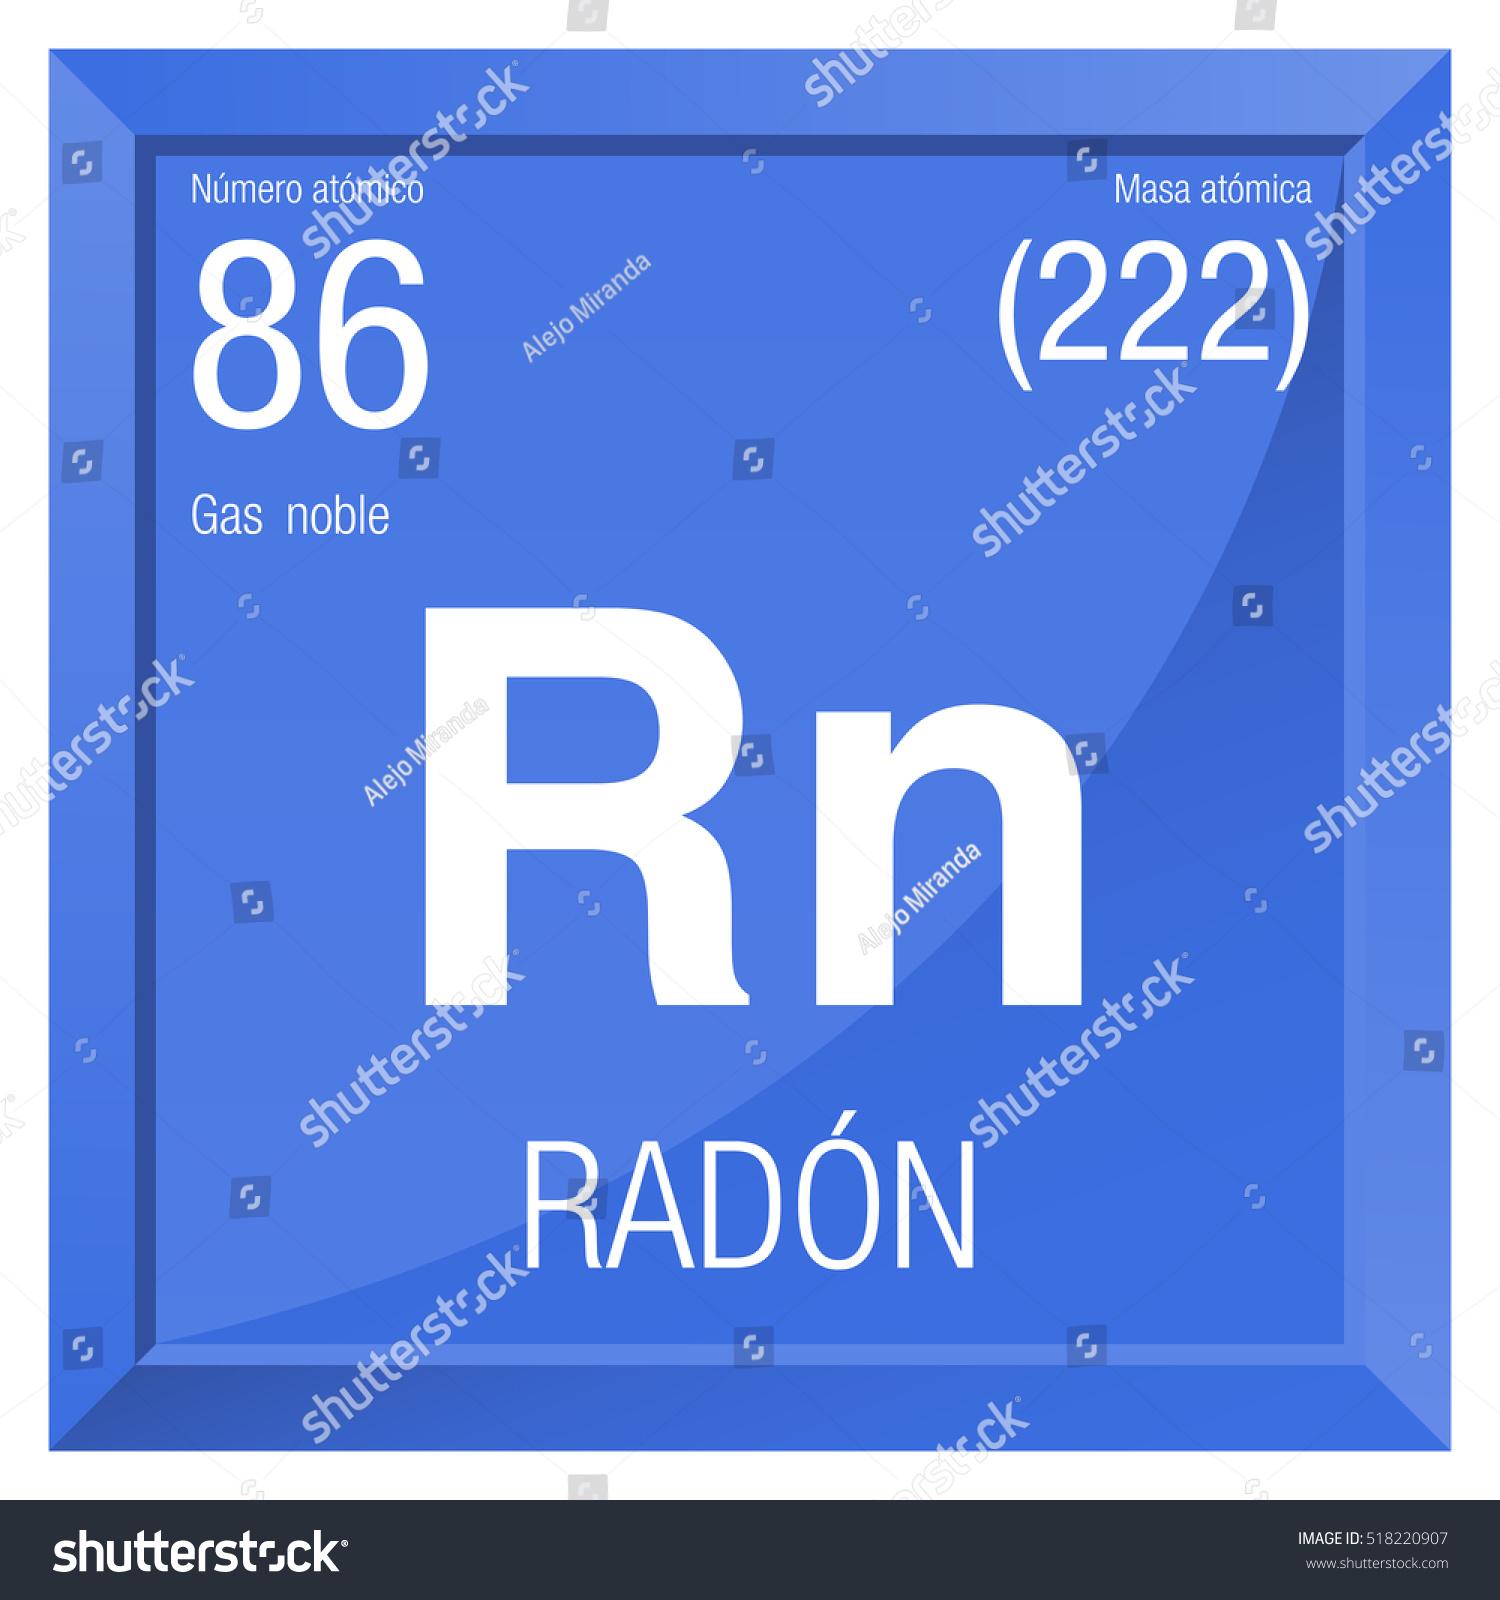 Radon symbol radon spanish language element stock vector 518220907 radon symbol radon in spanish language element number 86 of the periodic table of buycottarizona